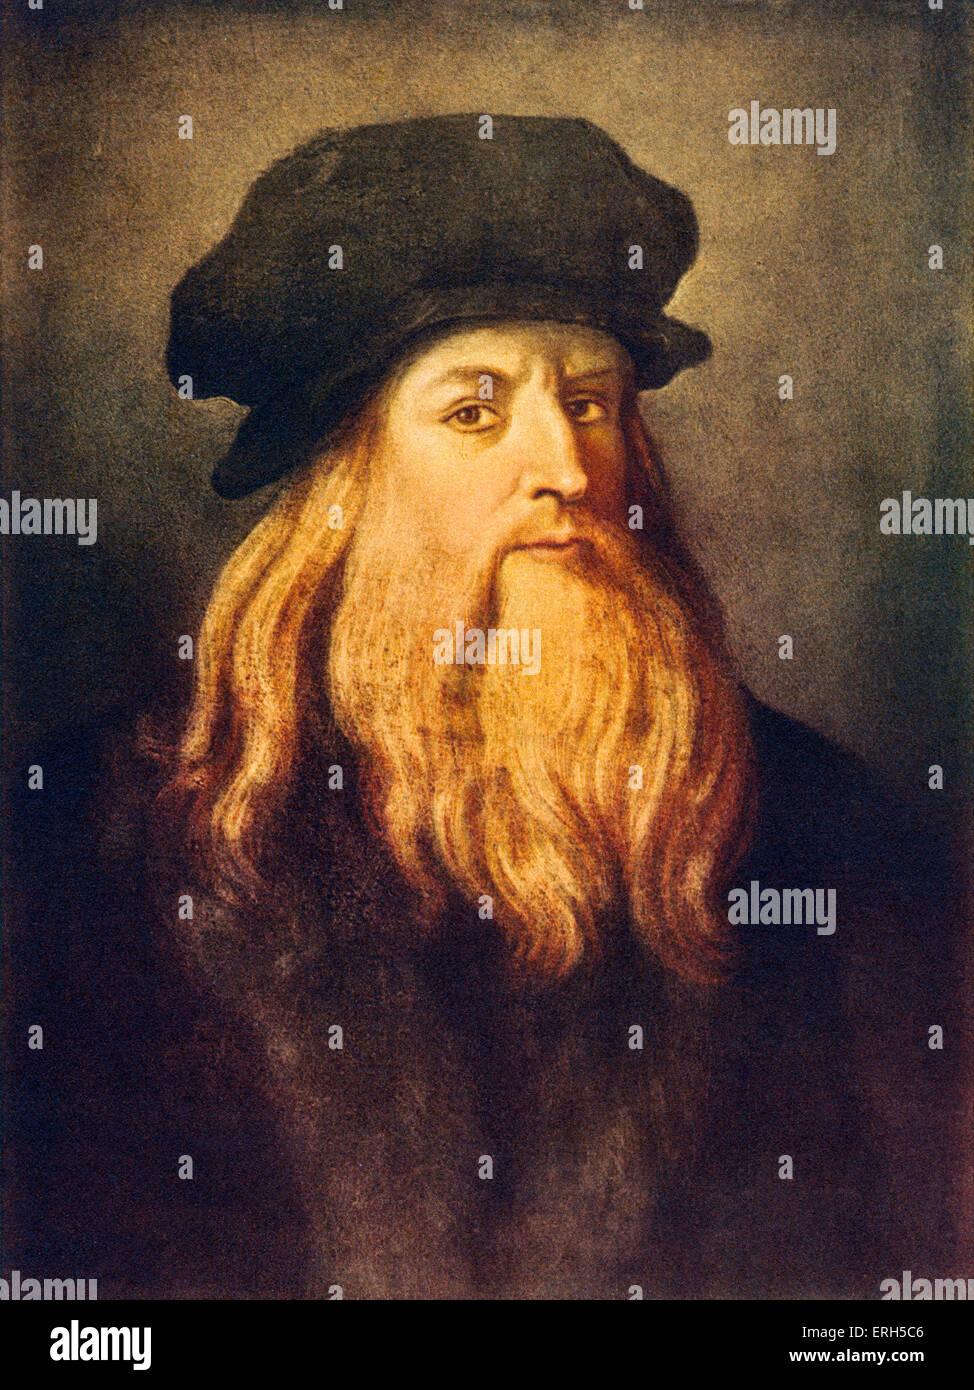 Leonardo Da Vinci Self Portrait Of The Italian Renaissance Painter Stock Photo Alamy